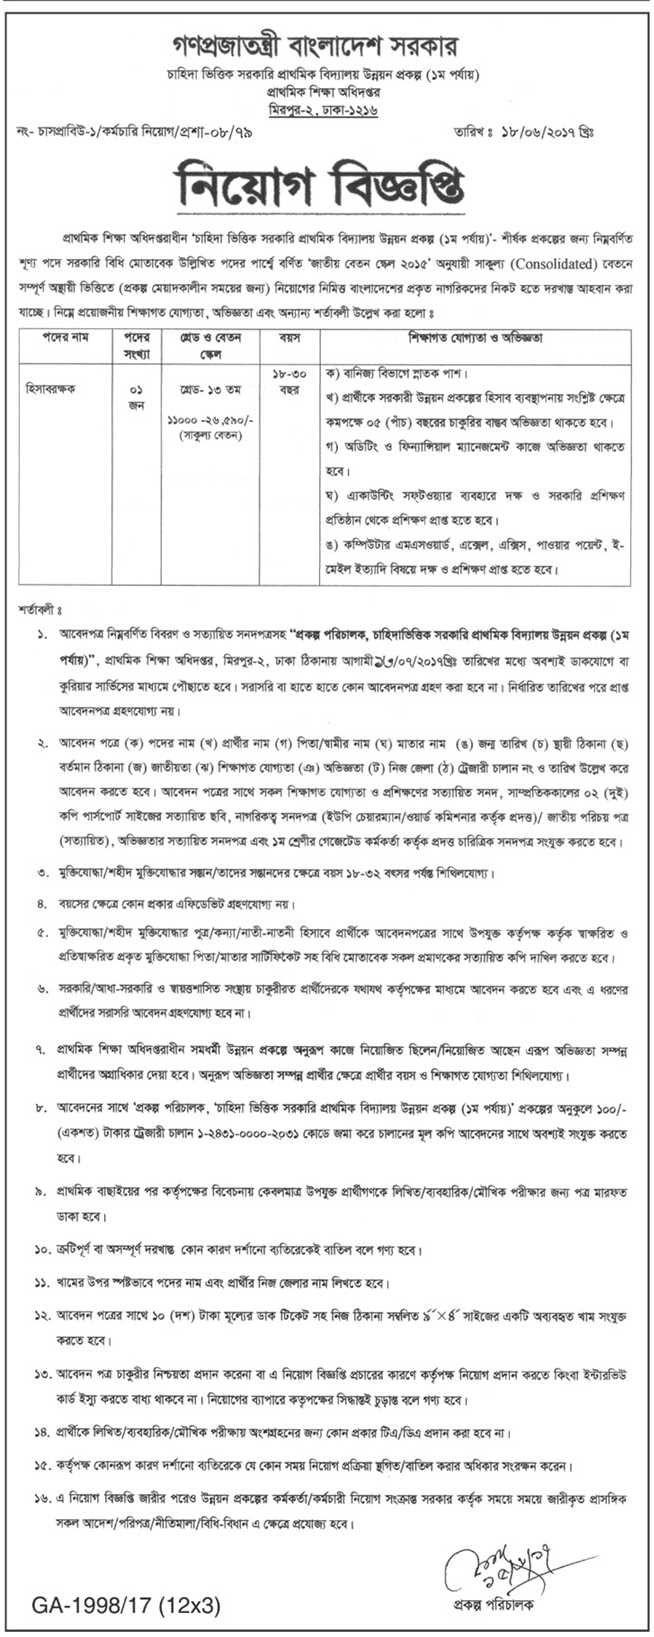 Directorate Of Primary Education Job Circular 2017 Bangladesh